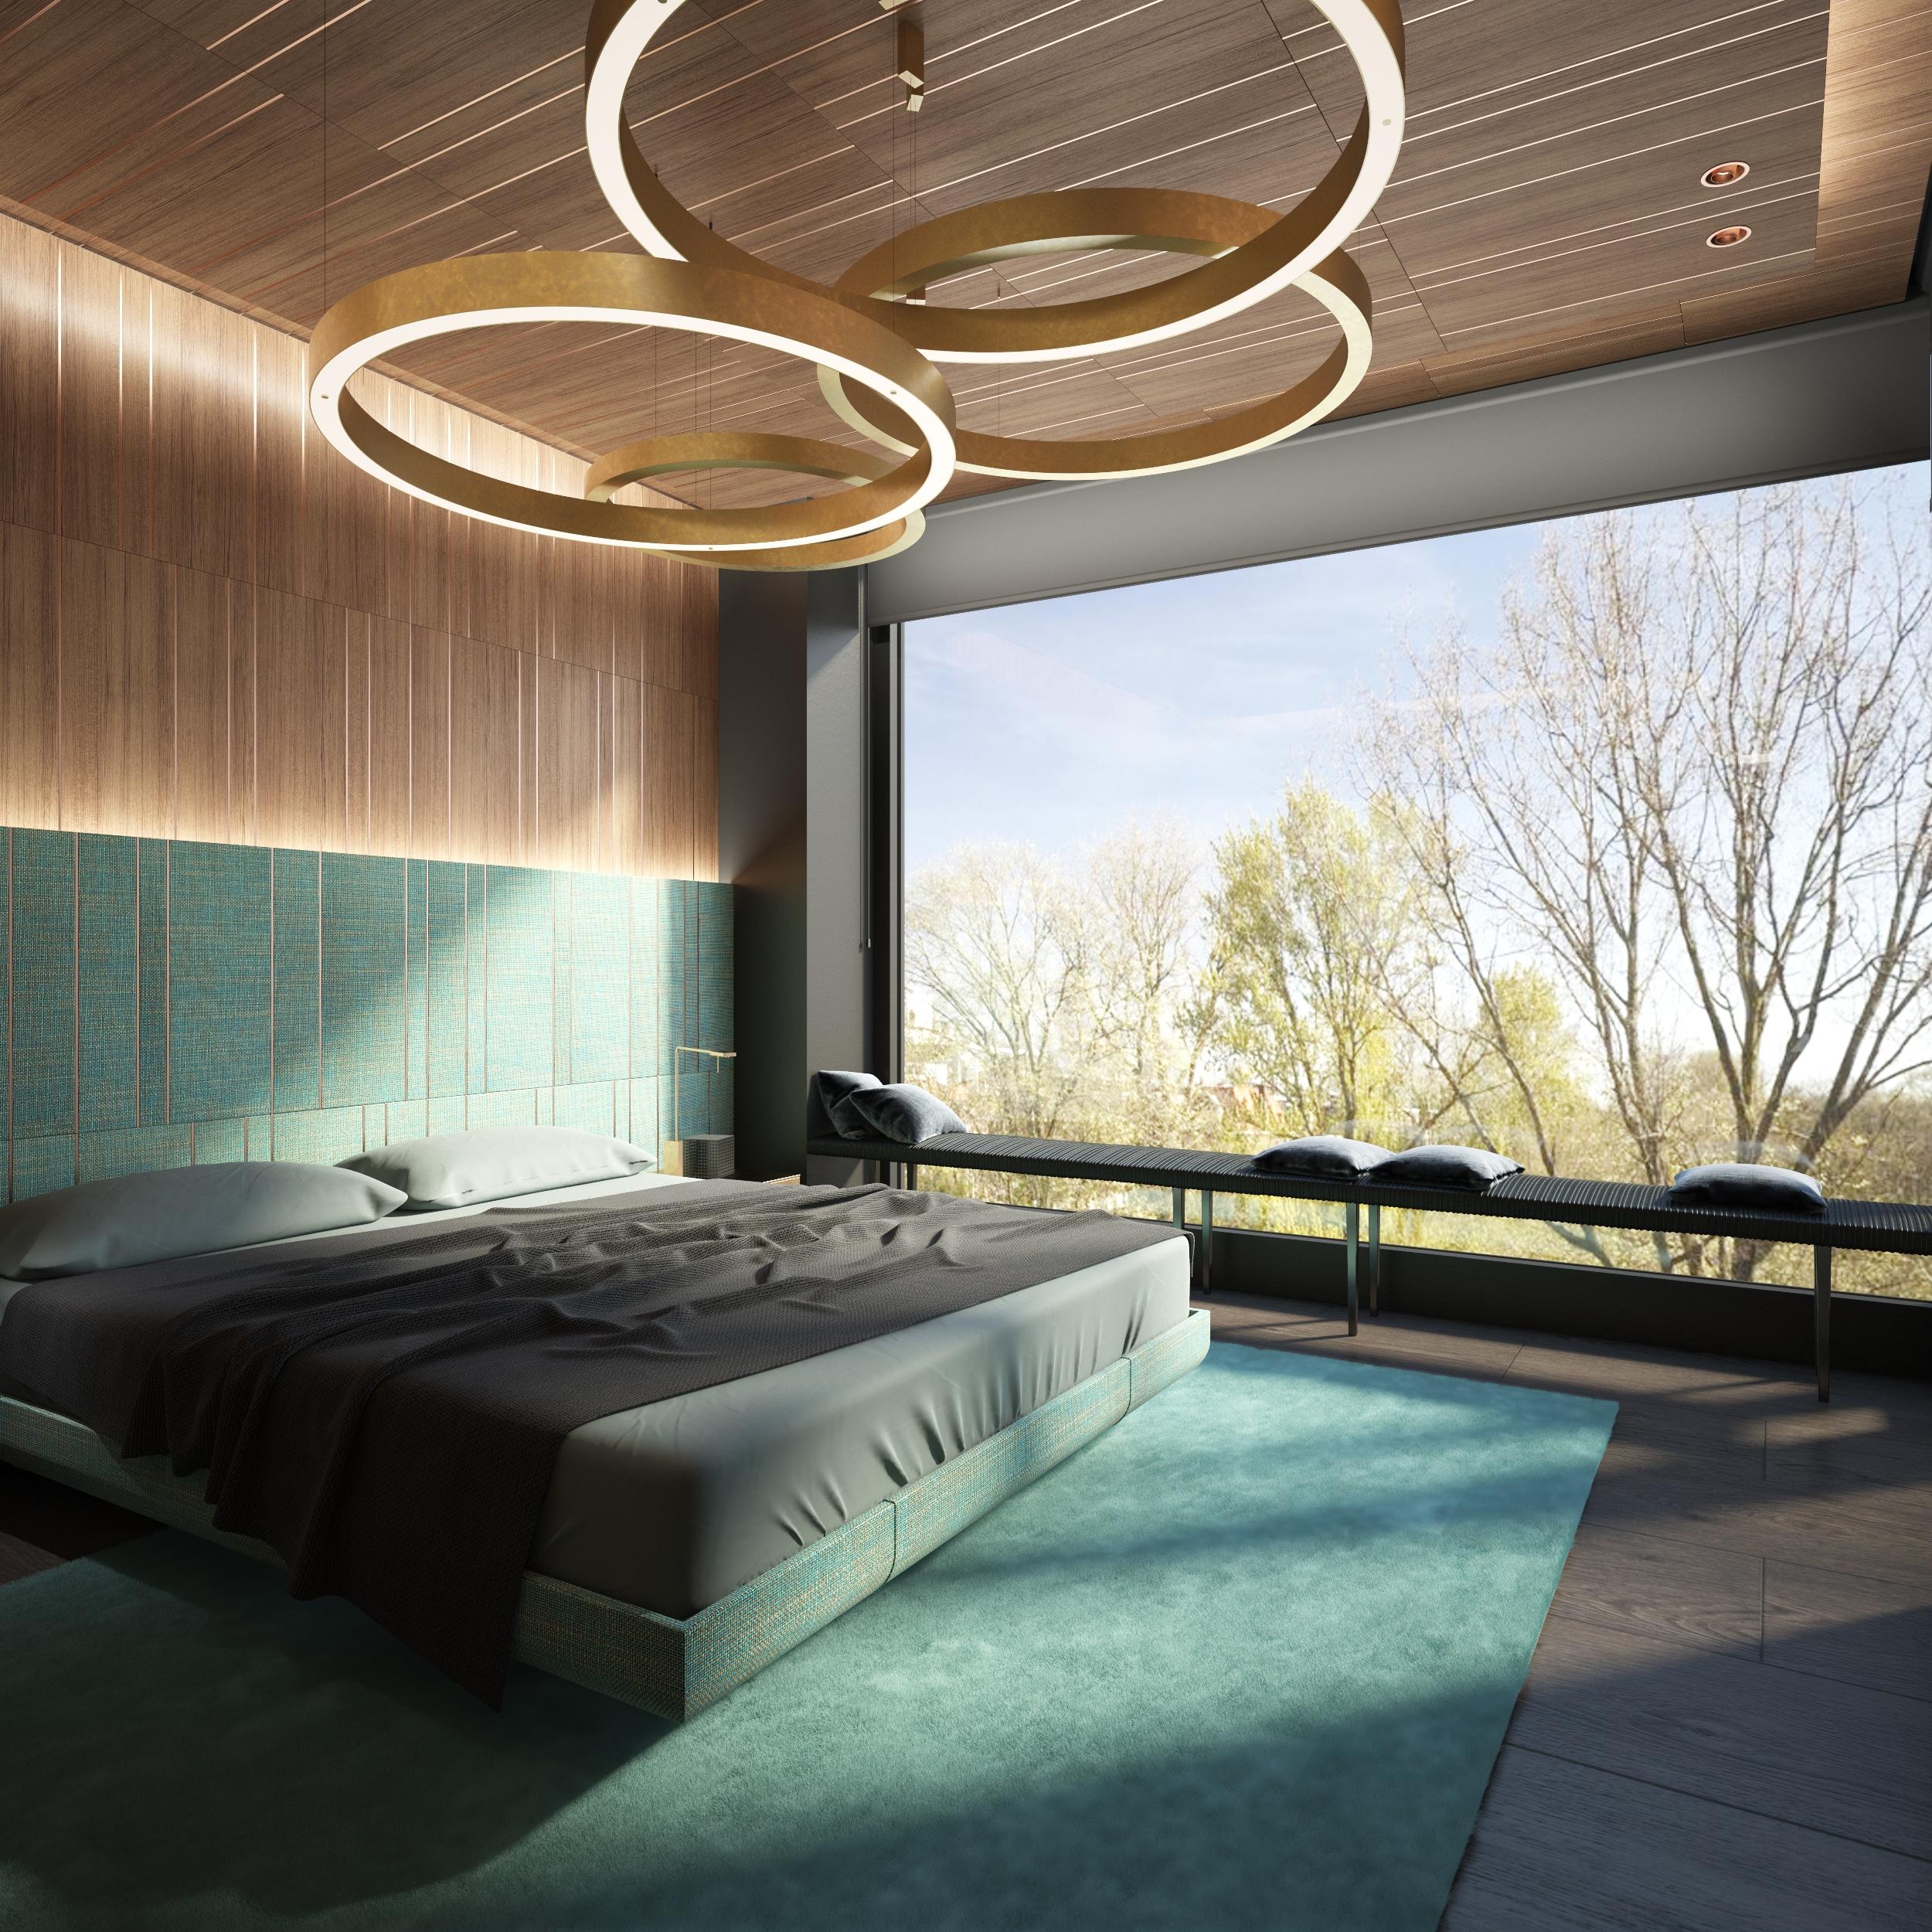 Dis Studio Bedroom interior design wall textures and lighting